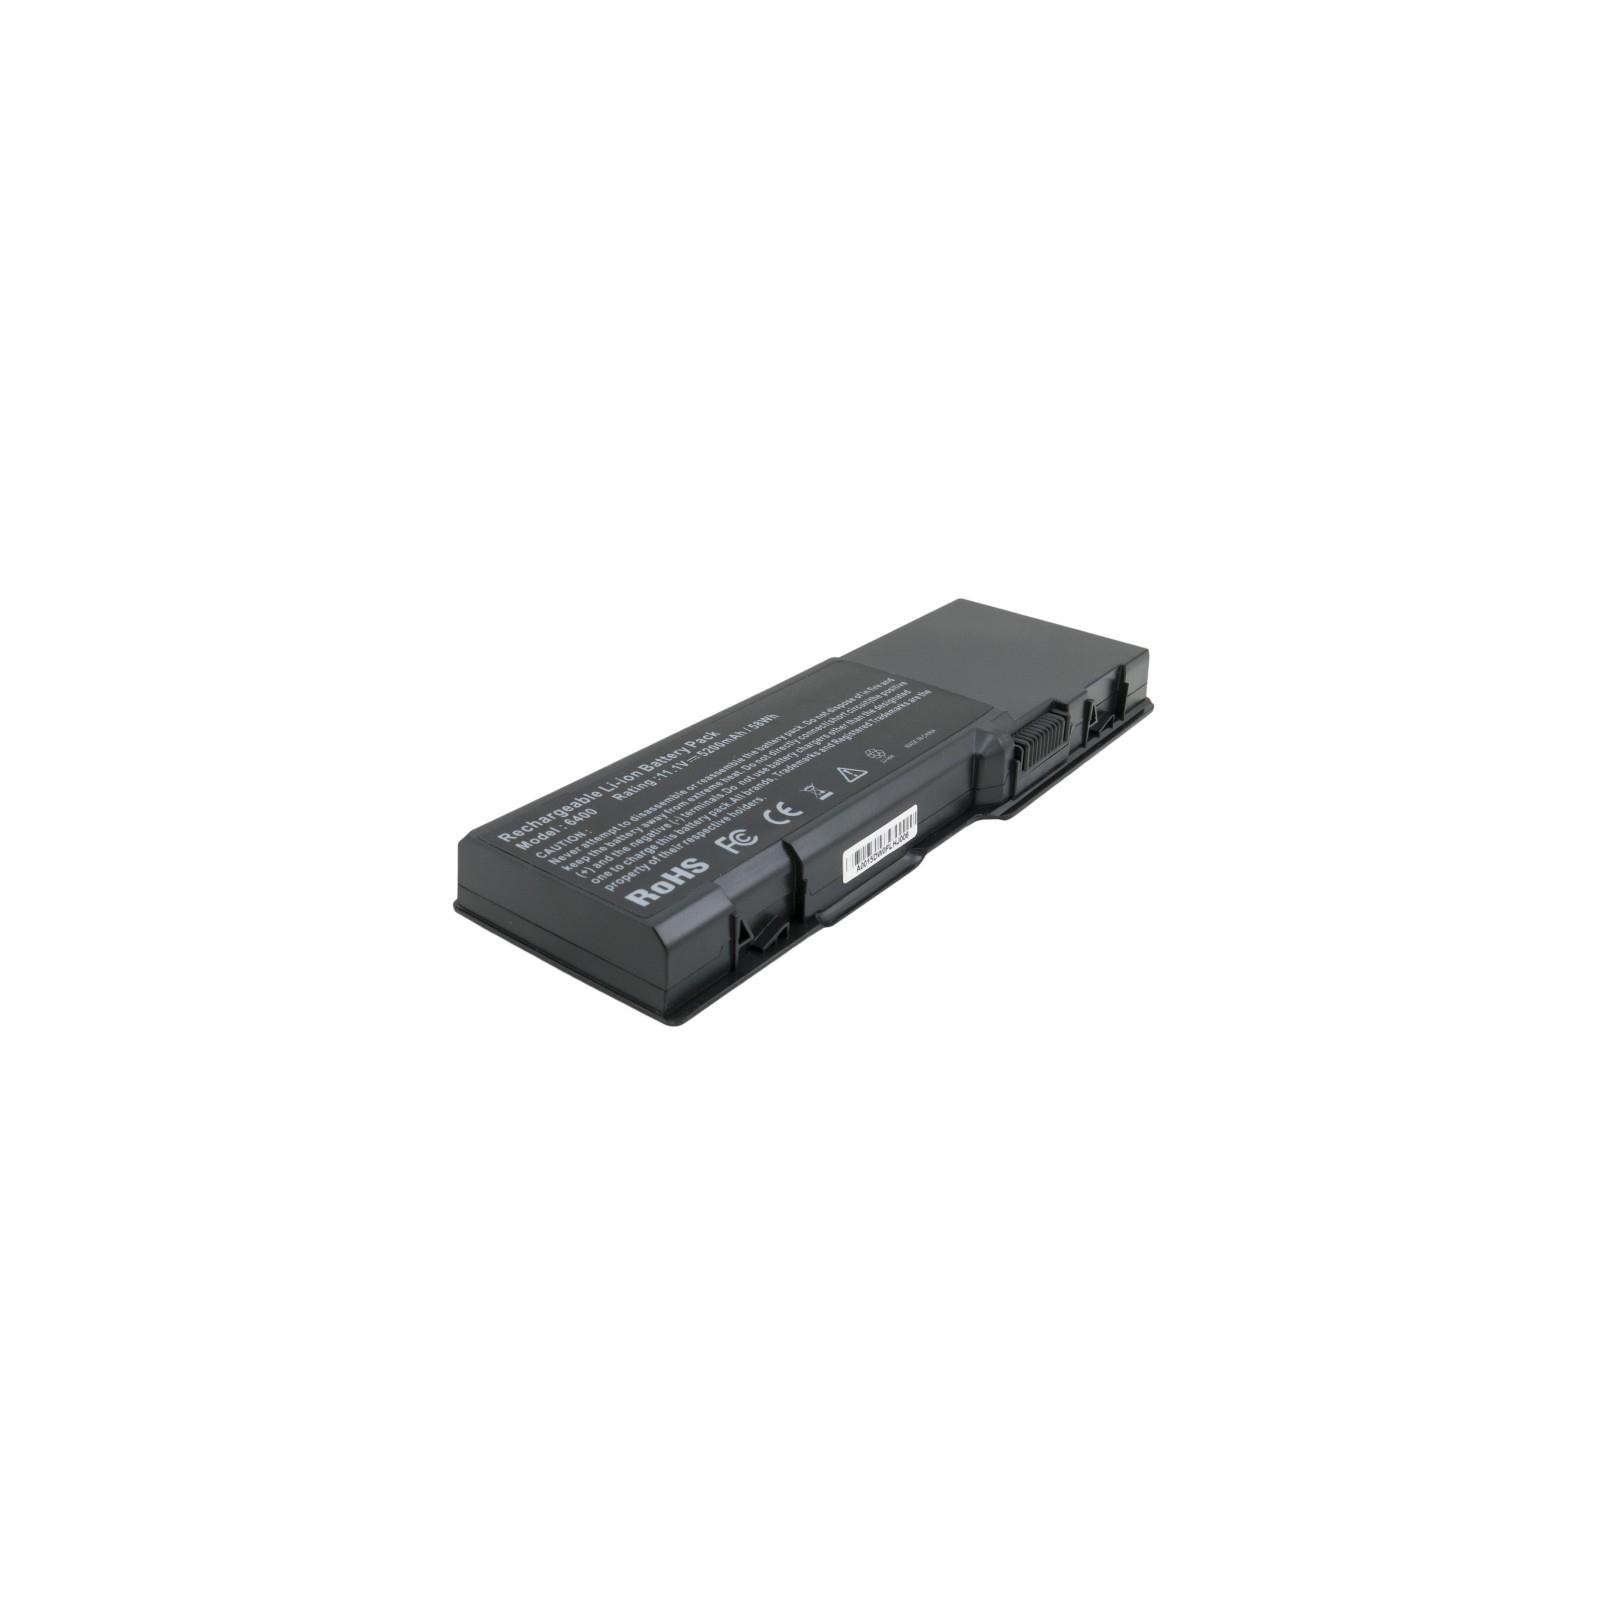 Аккумулятор для ноутбука Dell Inspiron 6400, 5200 mAh EXTRADIGITAL (BND3931) изображение 2